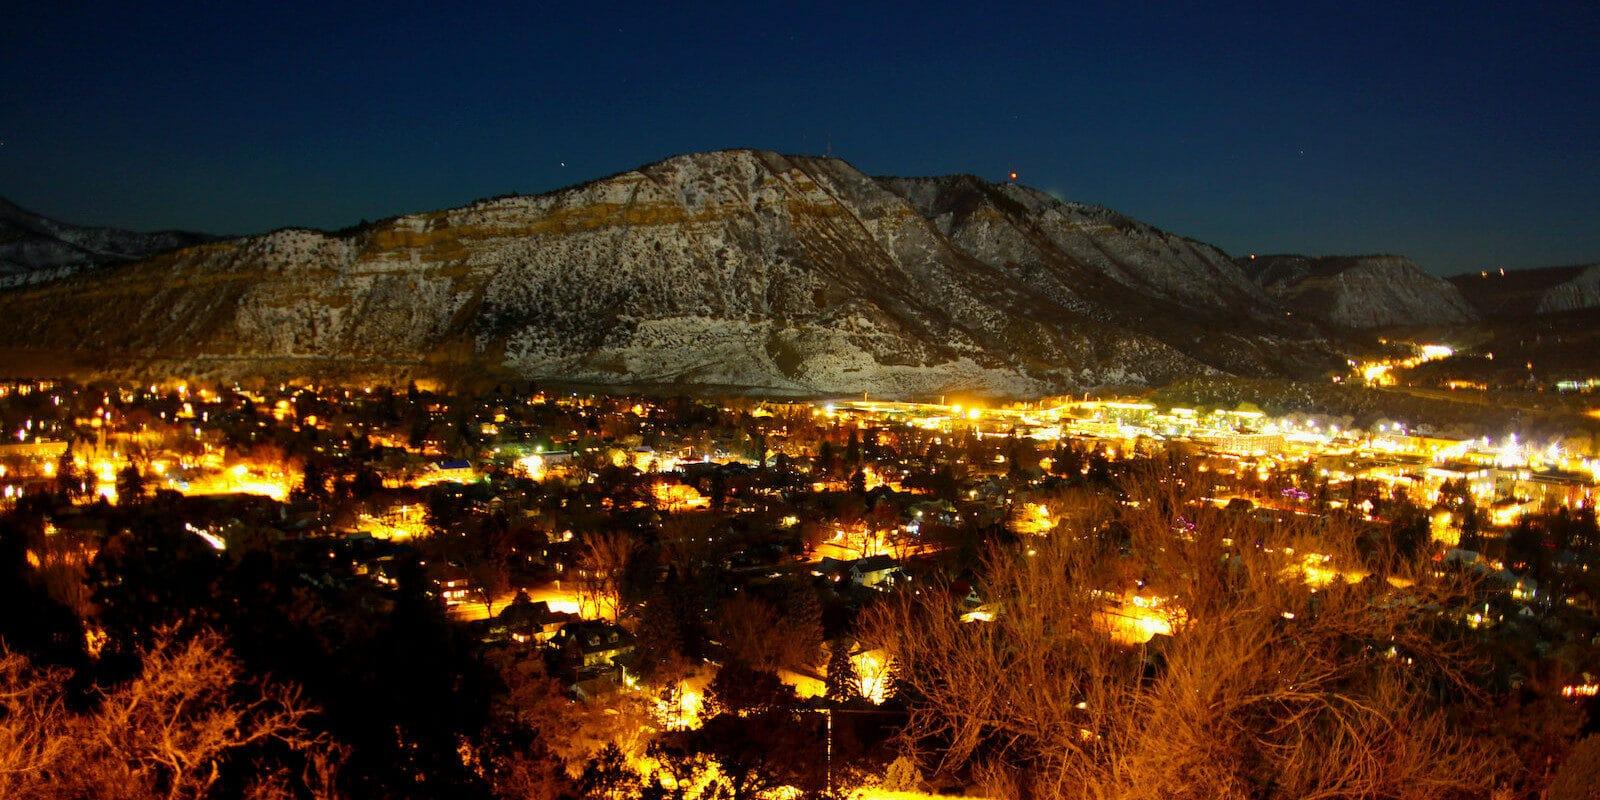 Image of Durango, Colorado at night